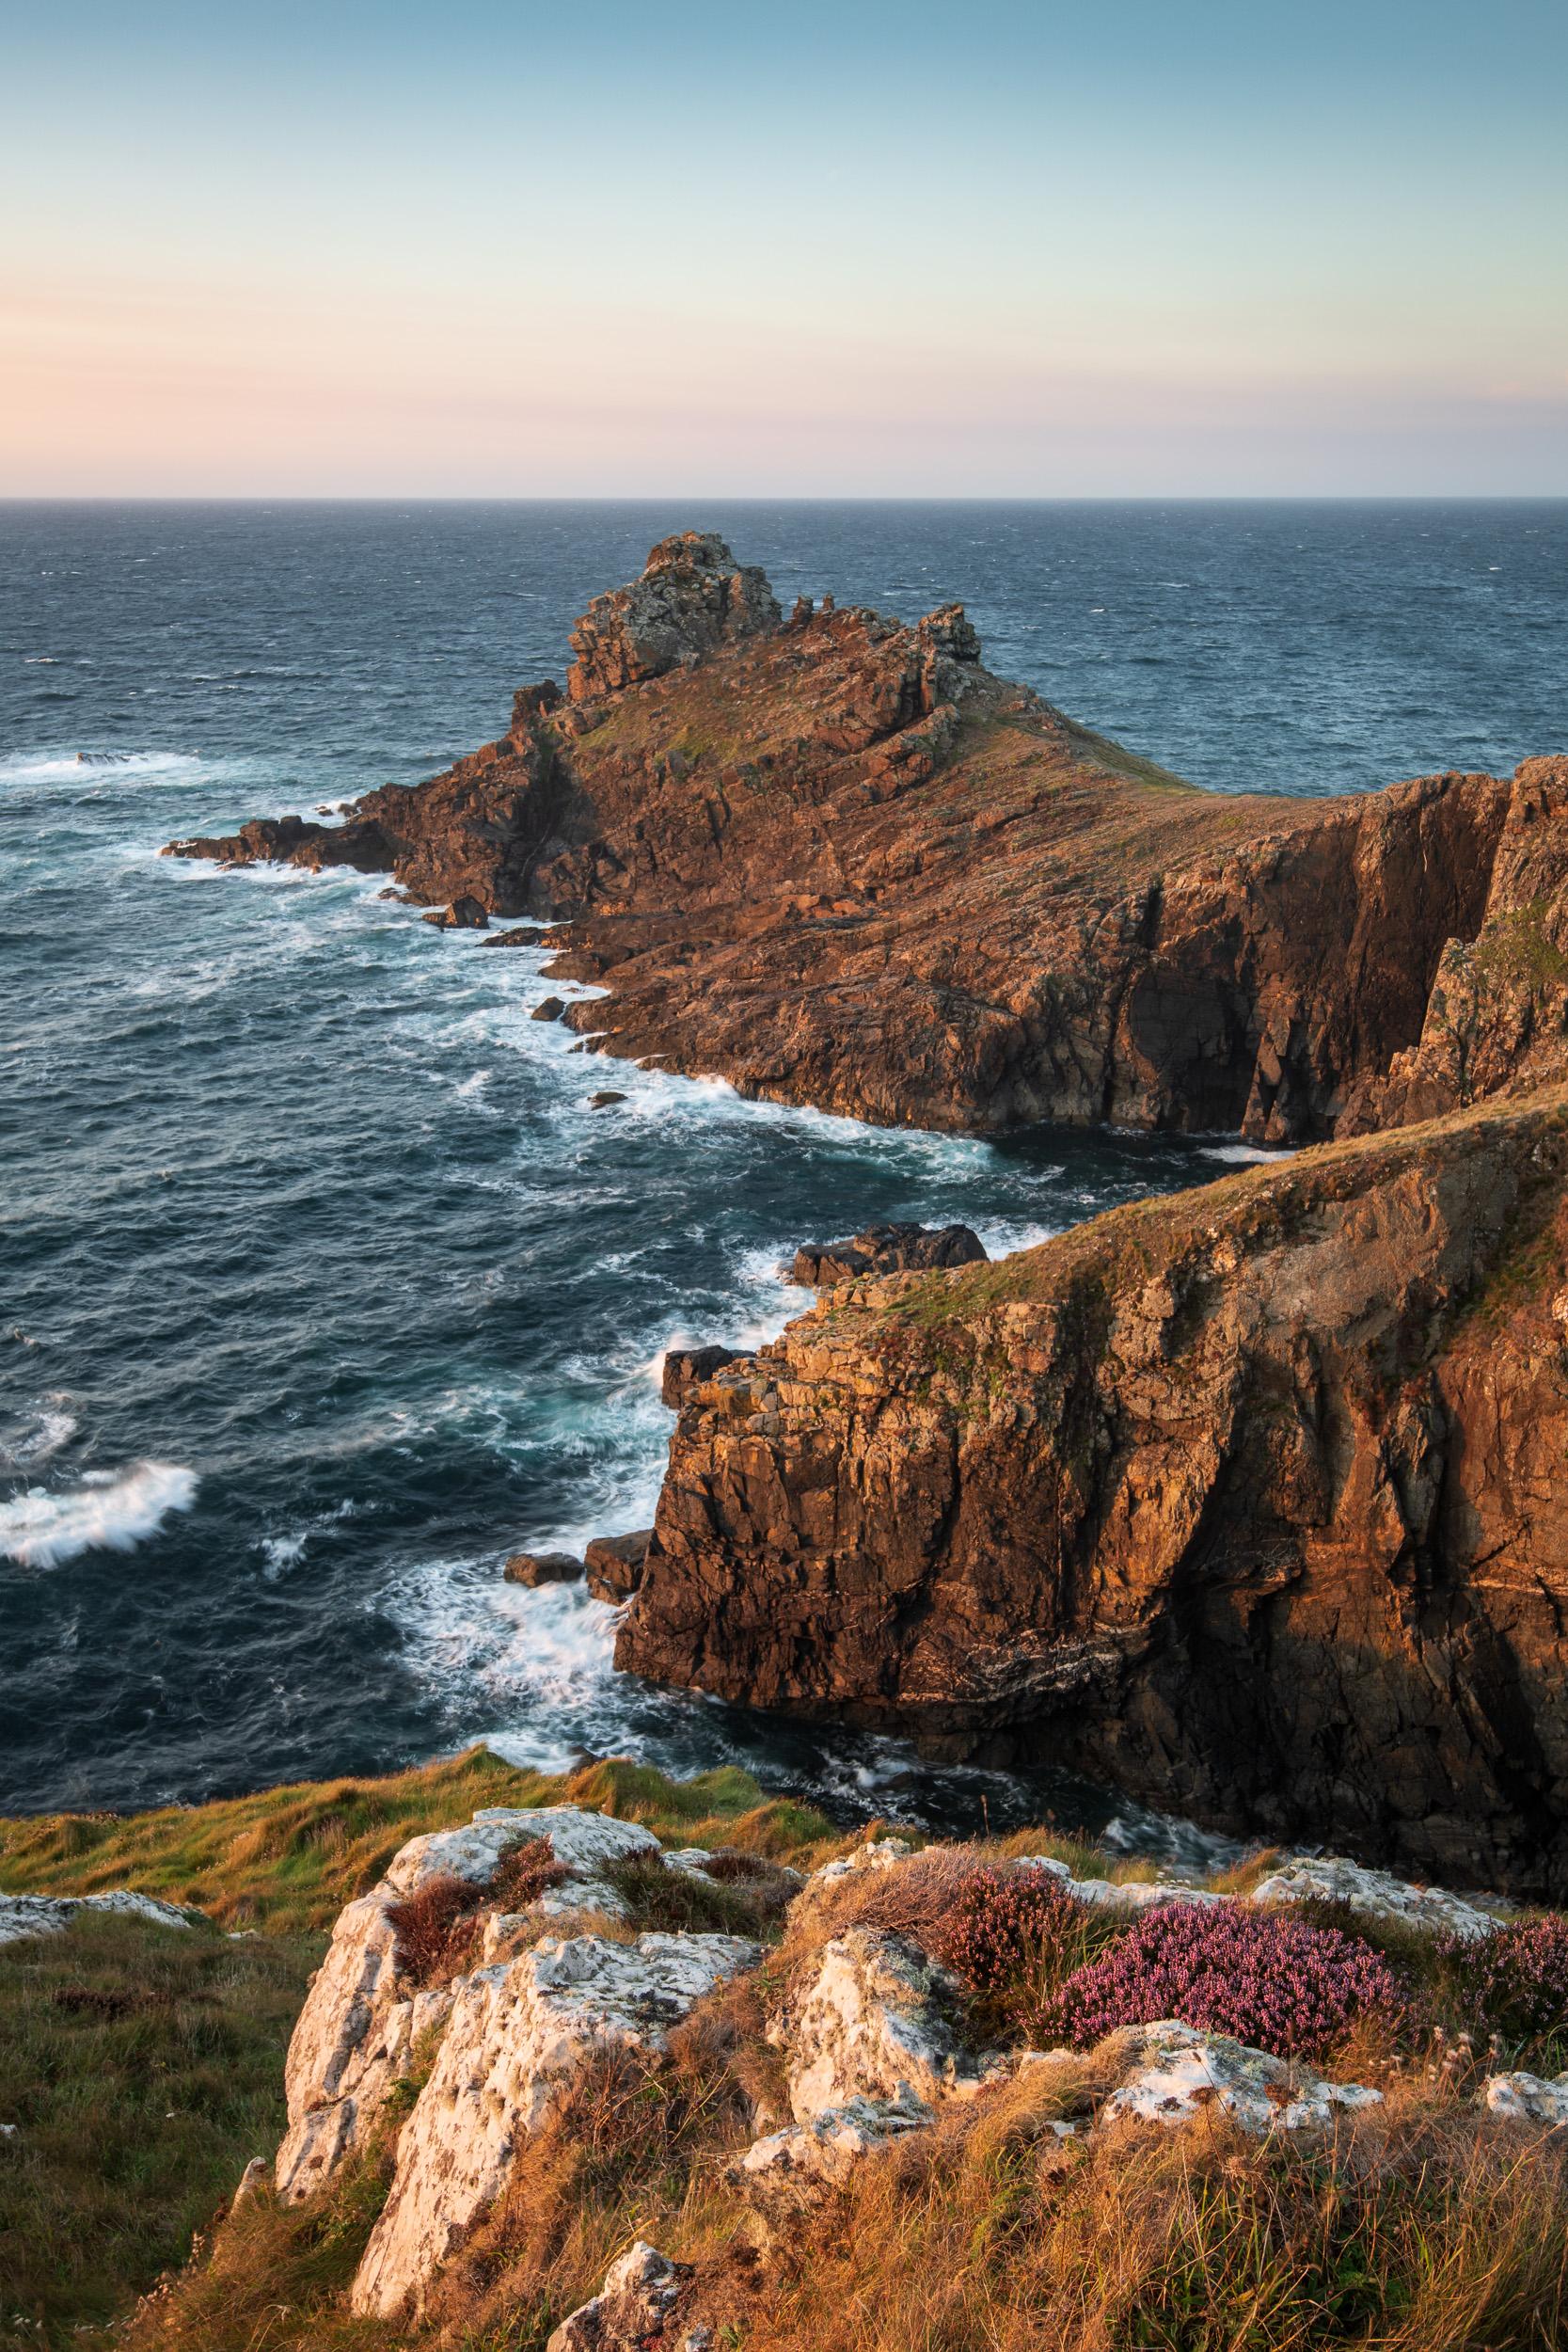 Gurnard's Head Sunset #1, Cornwall  - Nikon D850, Nikkor 16-35 mm f/4 at 32 mm, 0.4 secs at ISO 64, f/13, Lee Filters ND Grad.